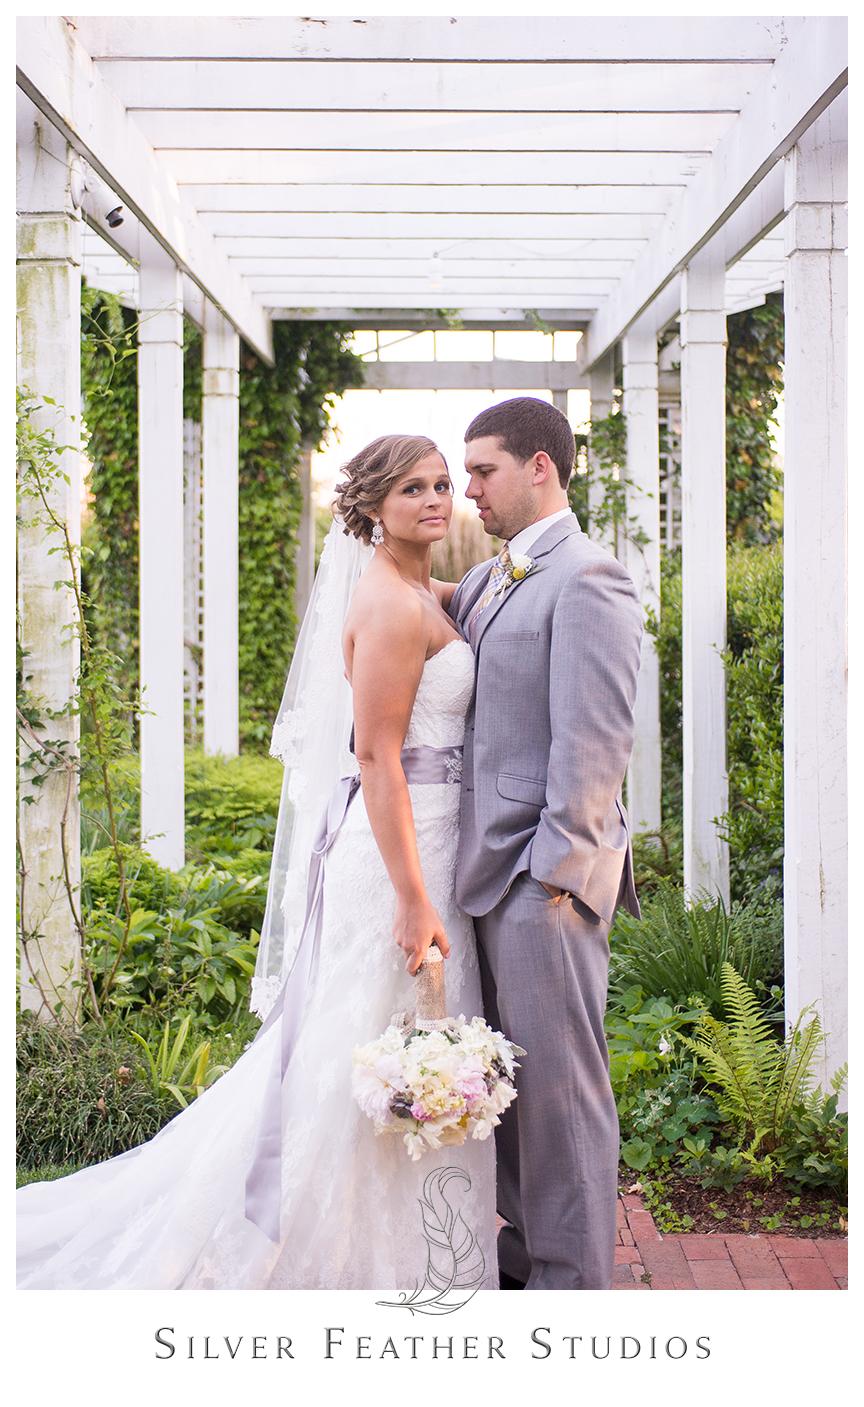 Jenna and Leo's Fearrington Village wedding in Pittsboro, North Carolina. © Silver Feather Studios, a Pittsboro wedding photographer and cinematographer.